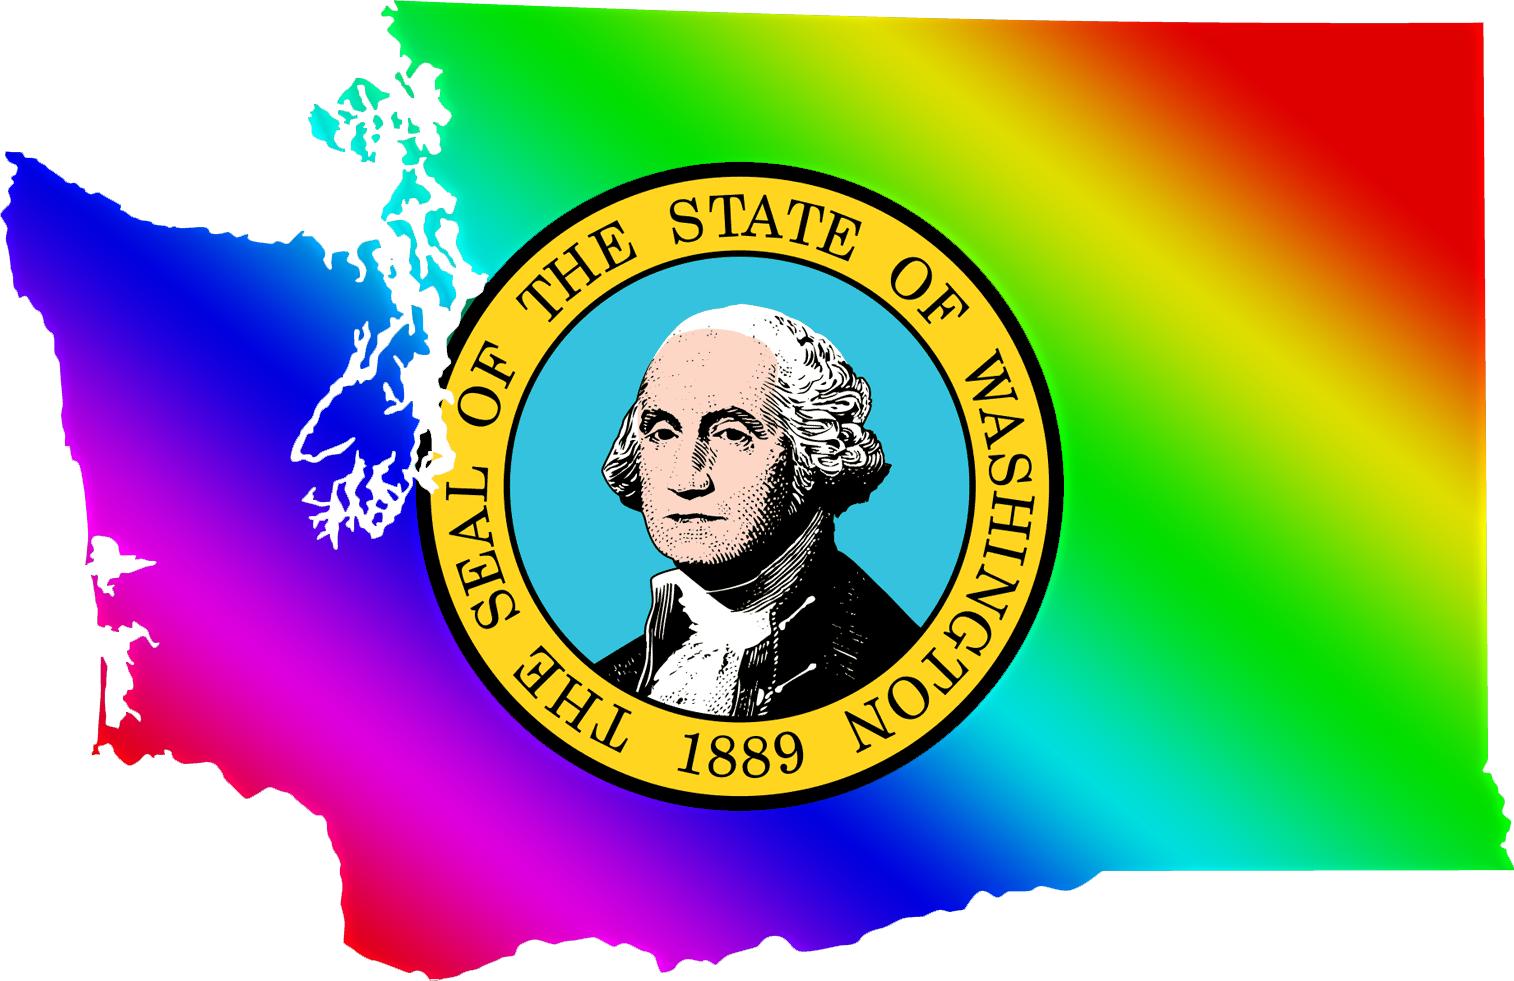 Washington state same sex marriage